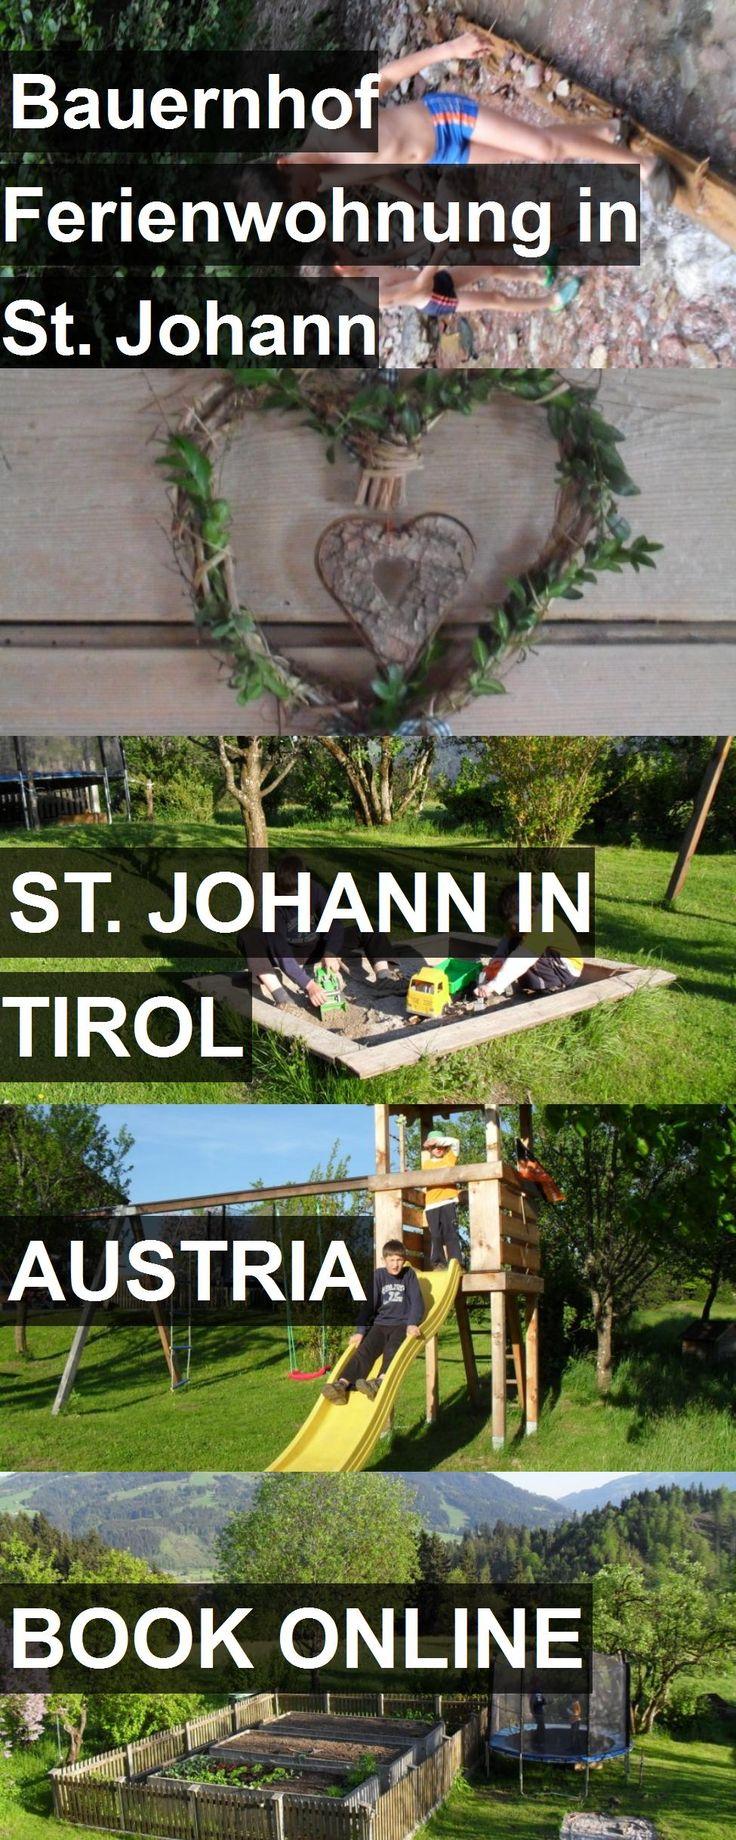 Hotel Bauernhof Ferienwohnung in St. Johann Oberbürghof in St. Johann in Tirol, Austria. For more information, photos, reviews and best prices please follow the link. #Austria #St.JohanninTirol #travel #vacation #hotel